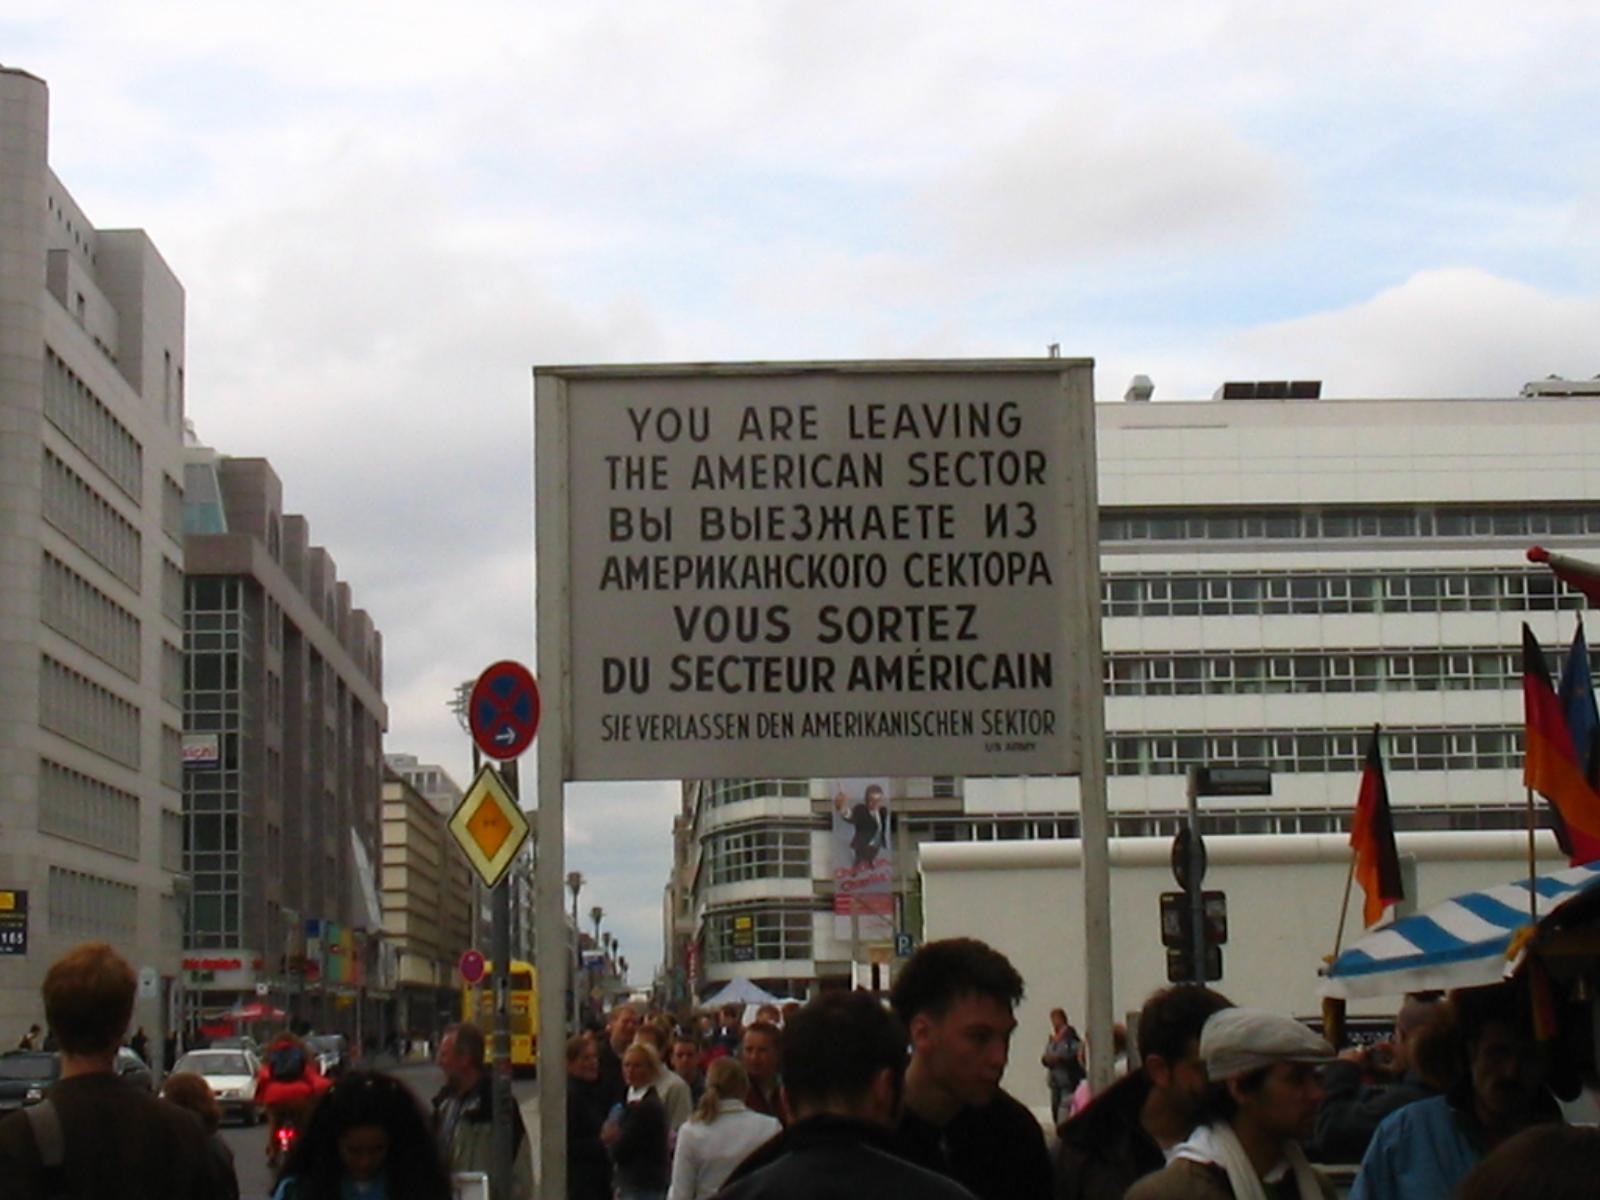 Check Point Charlie, Berlin